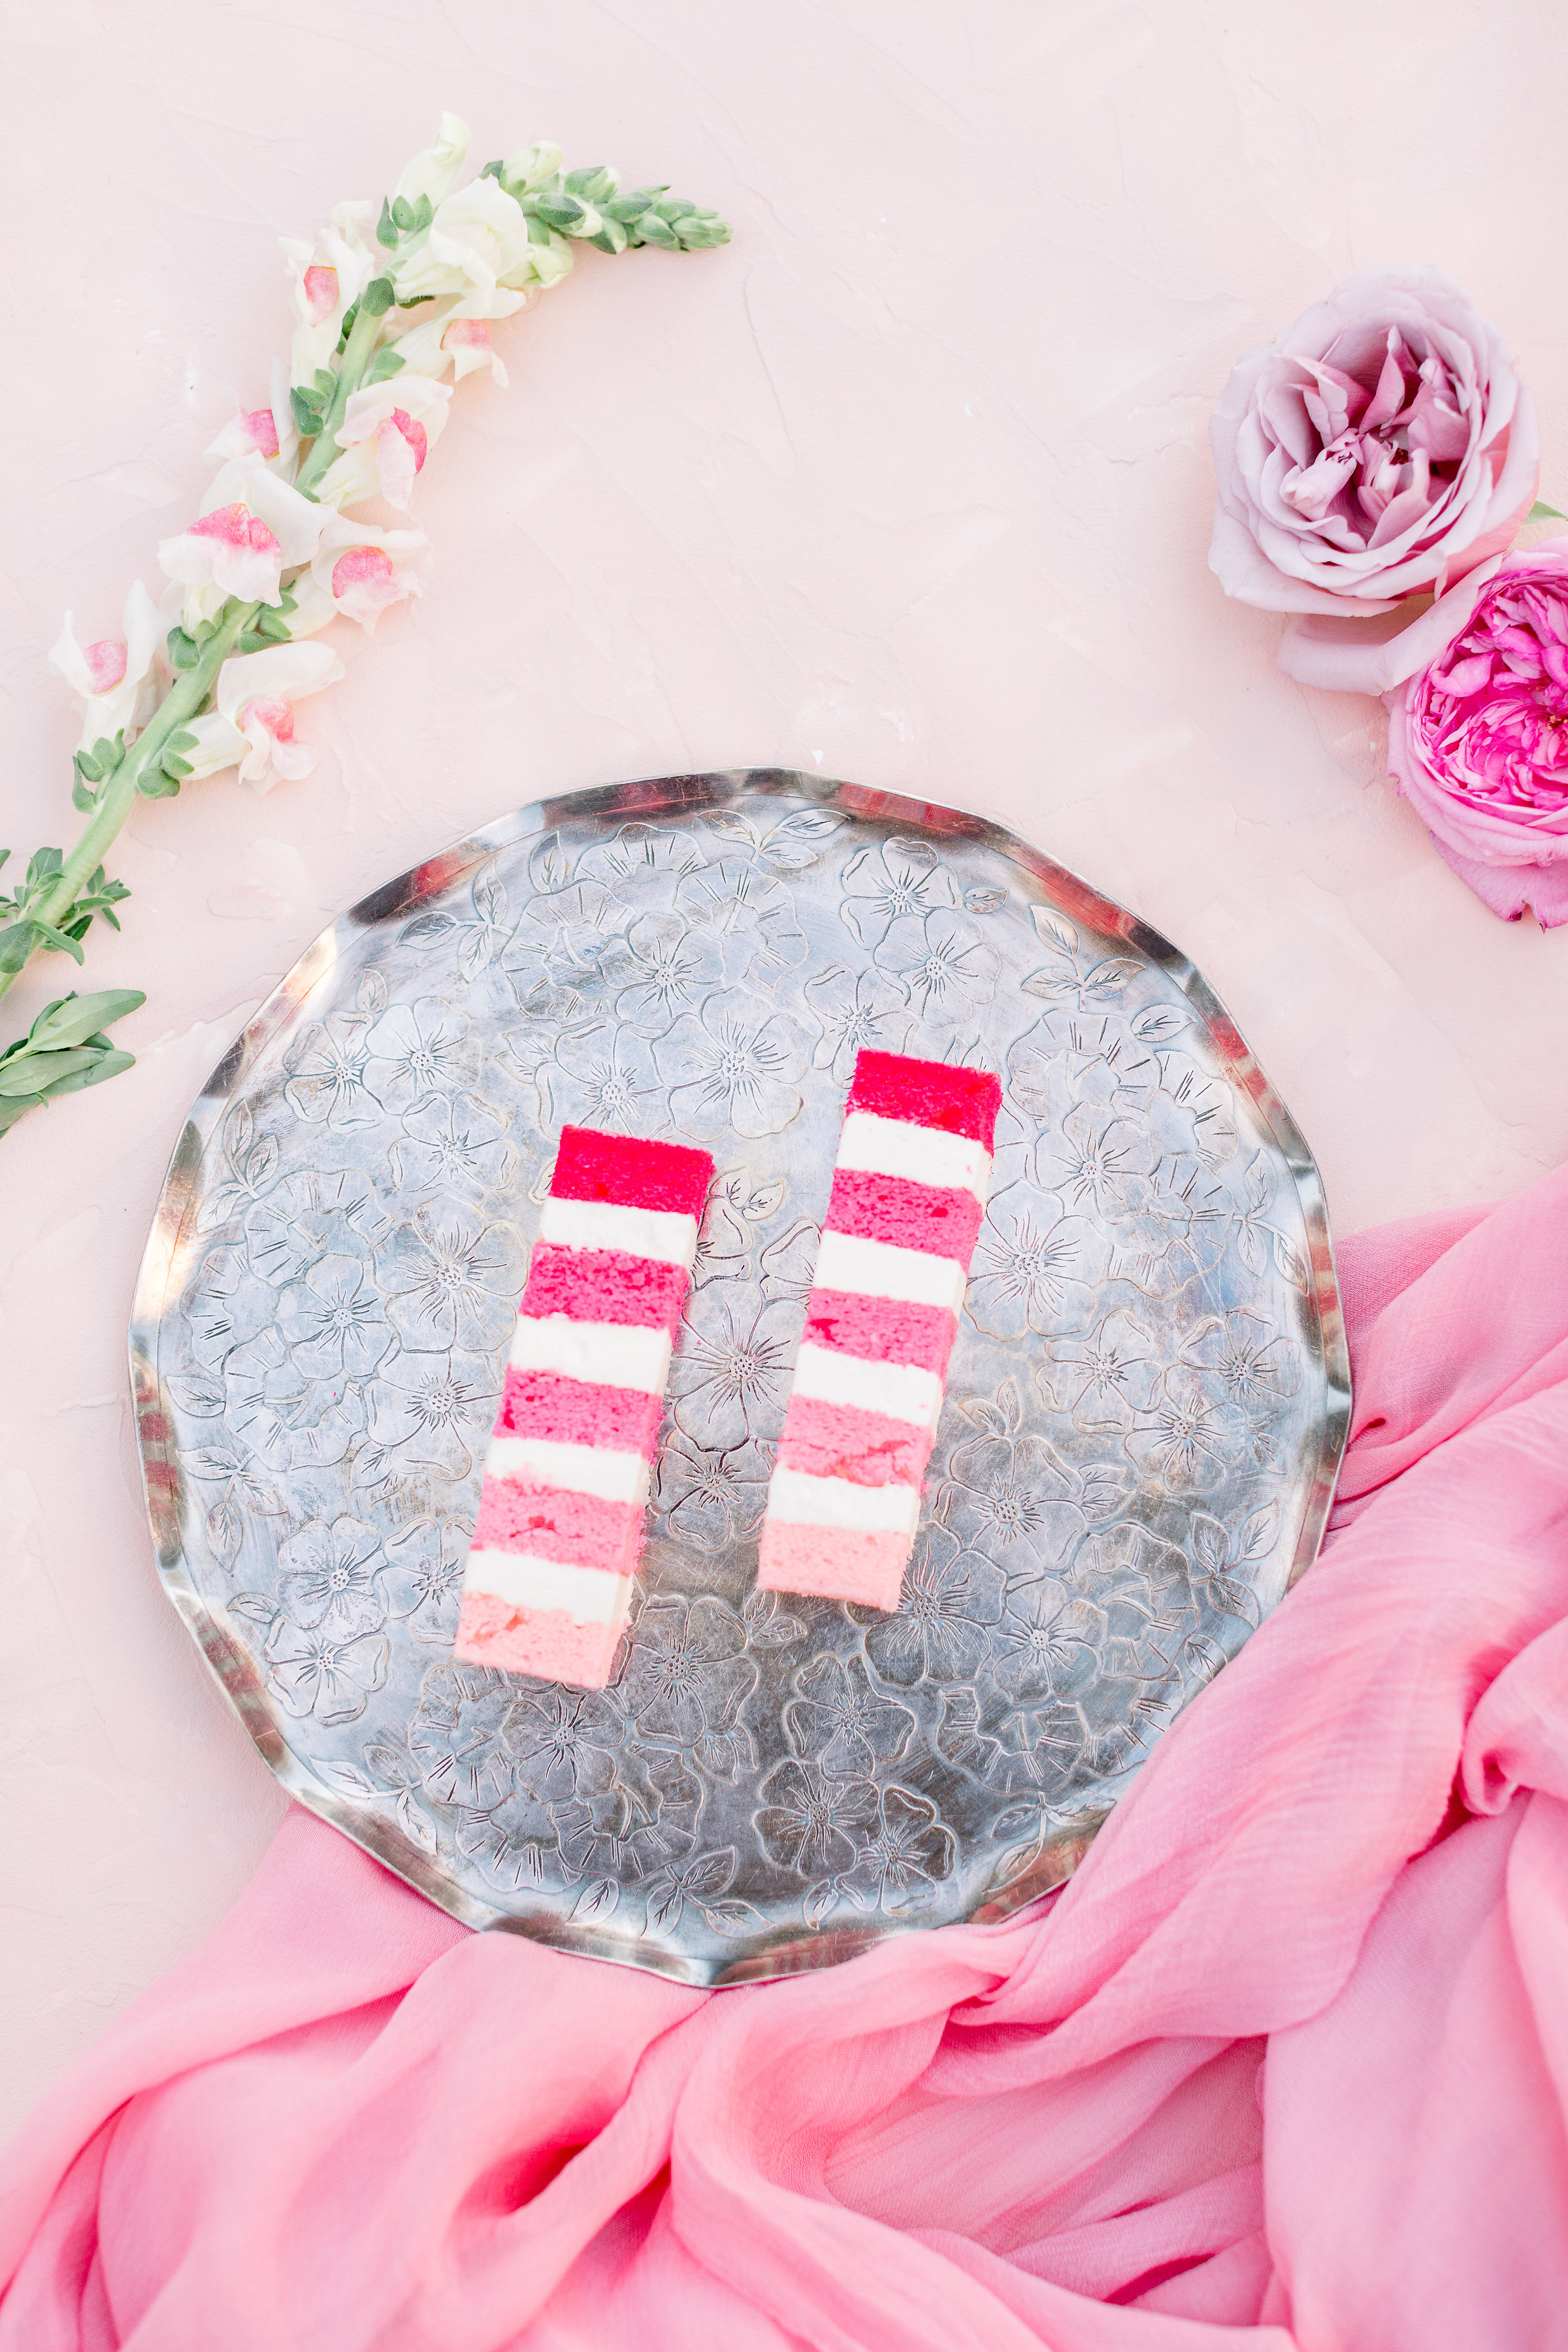 Pink Wedding | Feminine Wedding | Spring Wedding | Pink Wedding Flowers | Wedding Cake | Pink Wedding Cake | Fondant Wedding Cake | Pink Ombre Cake | Unique Wedding Cake